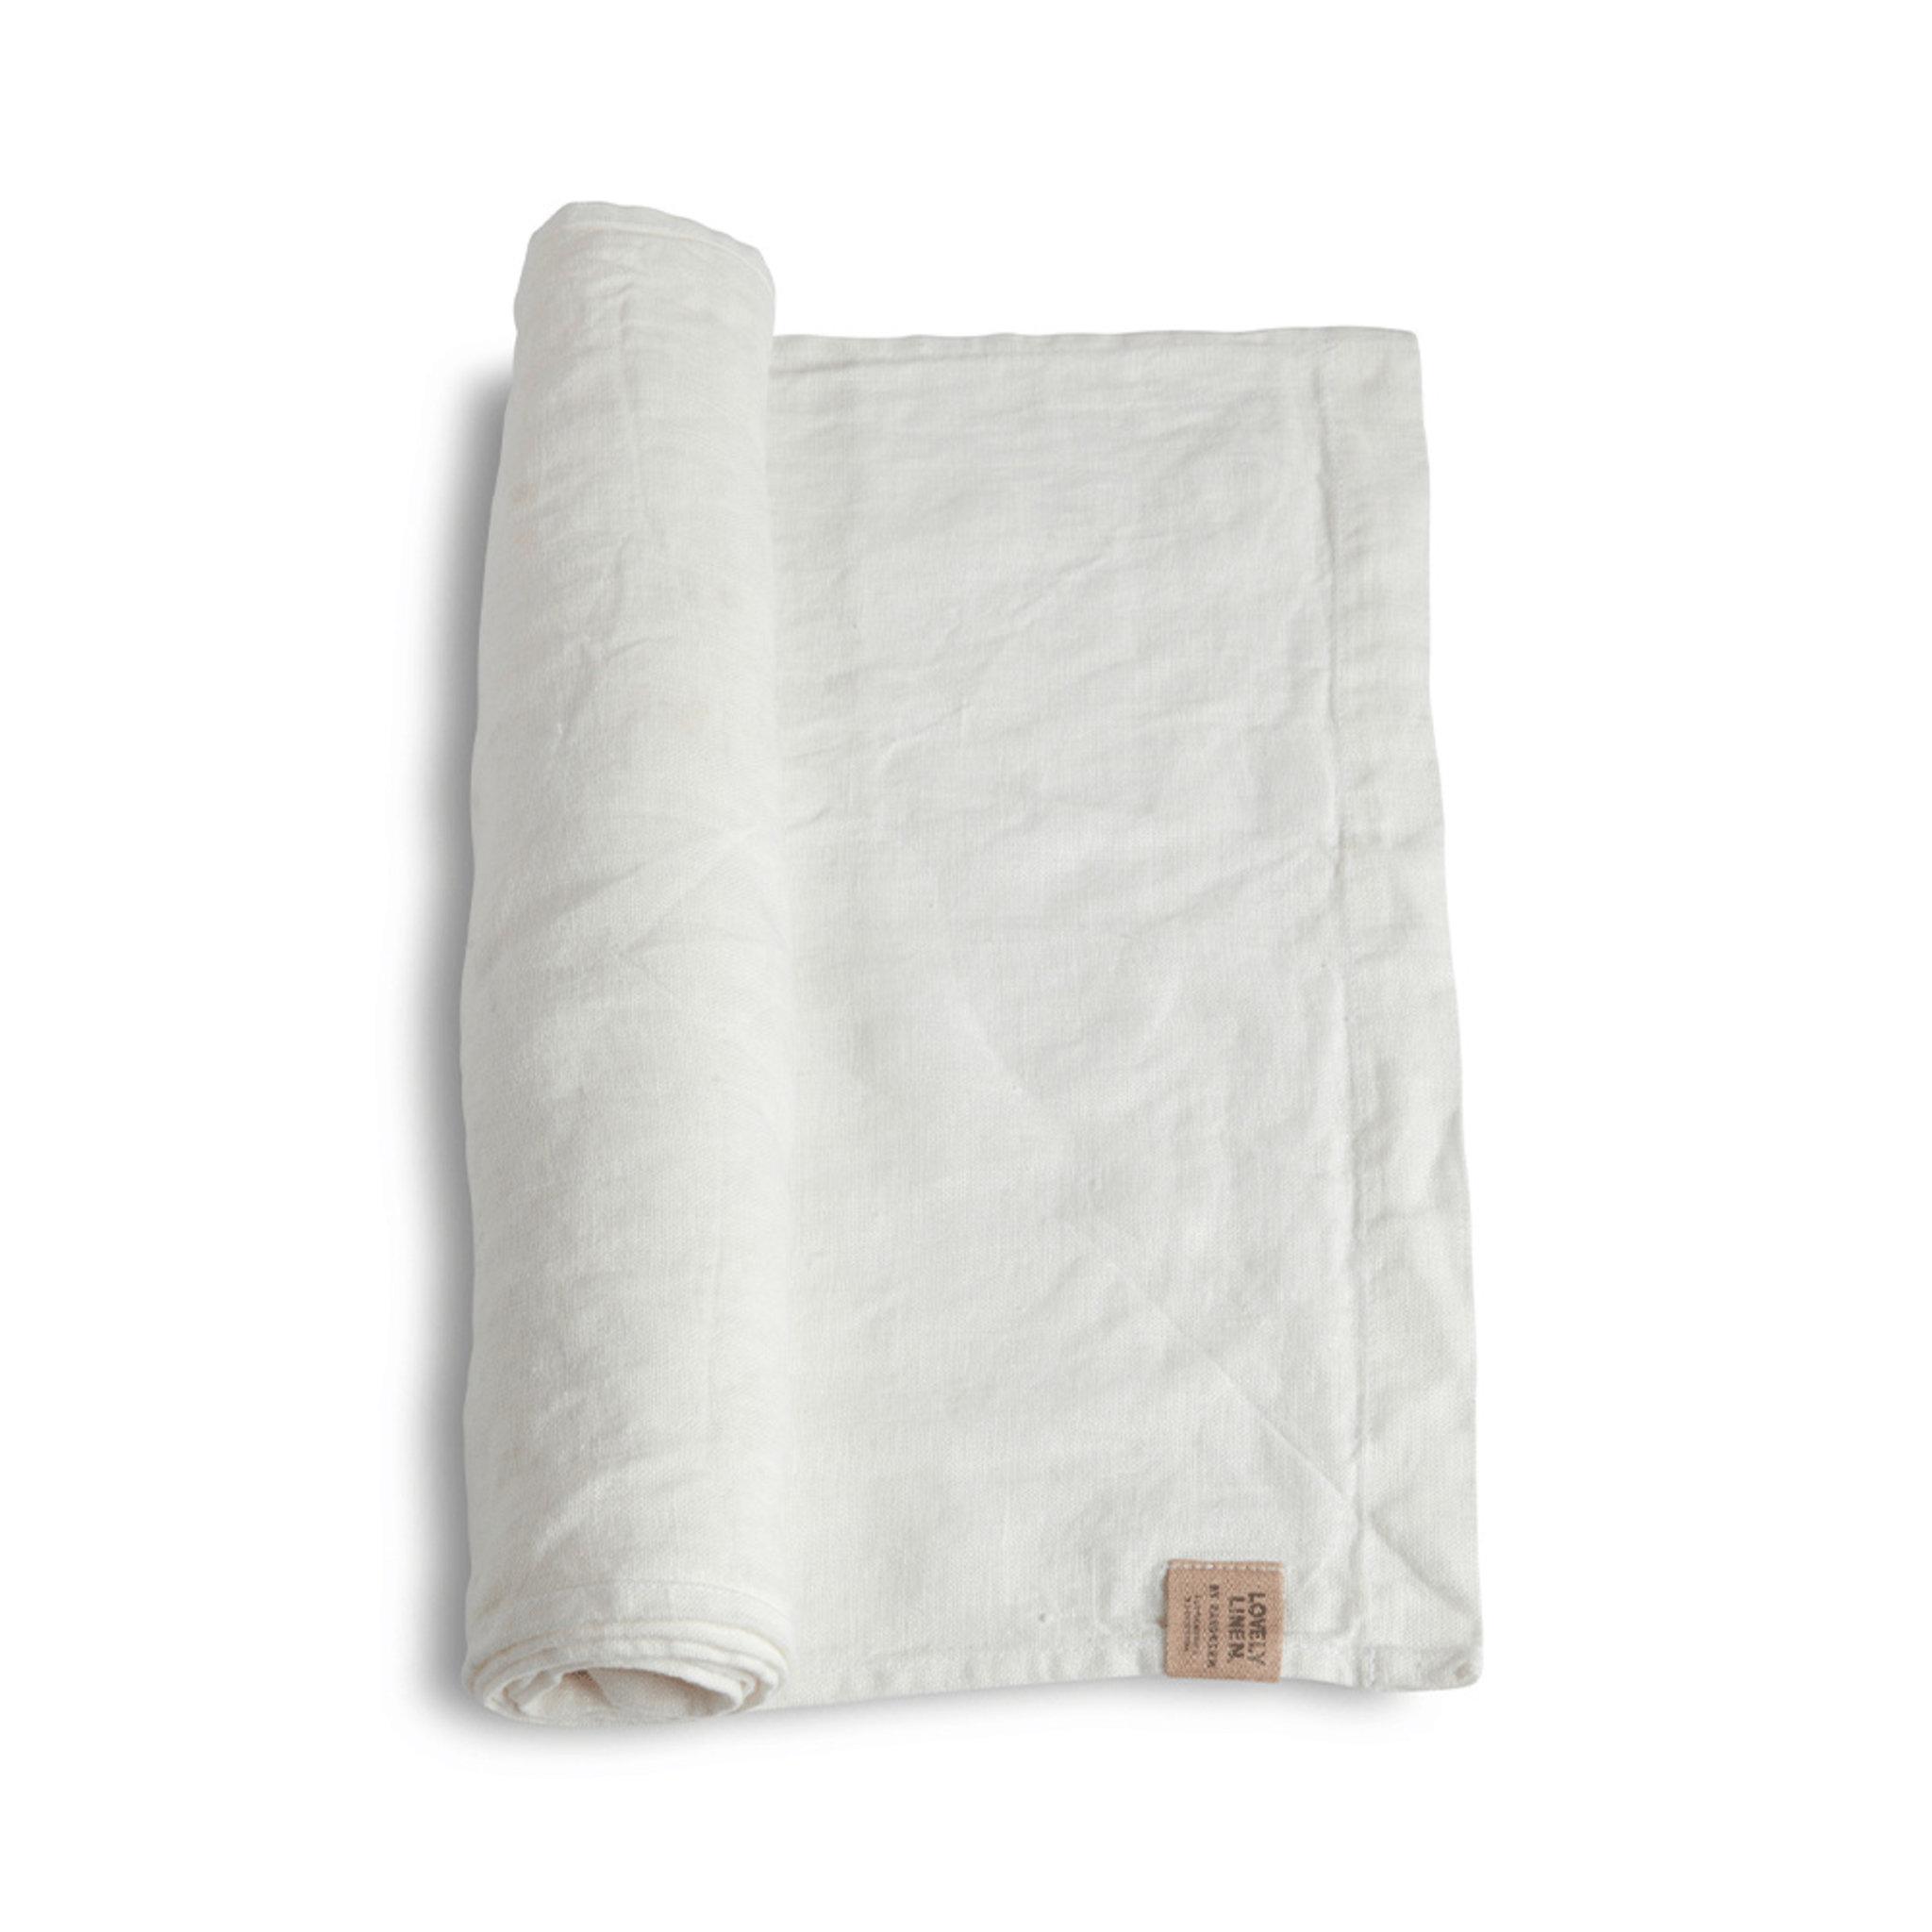 Löpare 45 x 150 cm Off-white